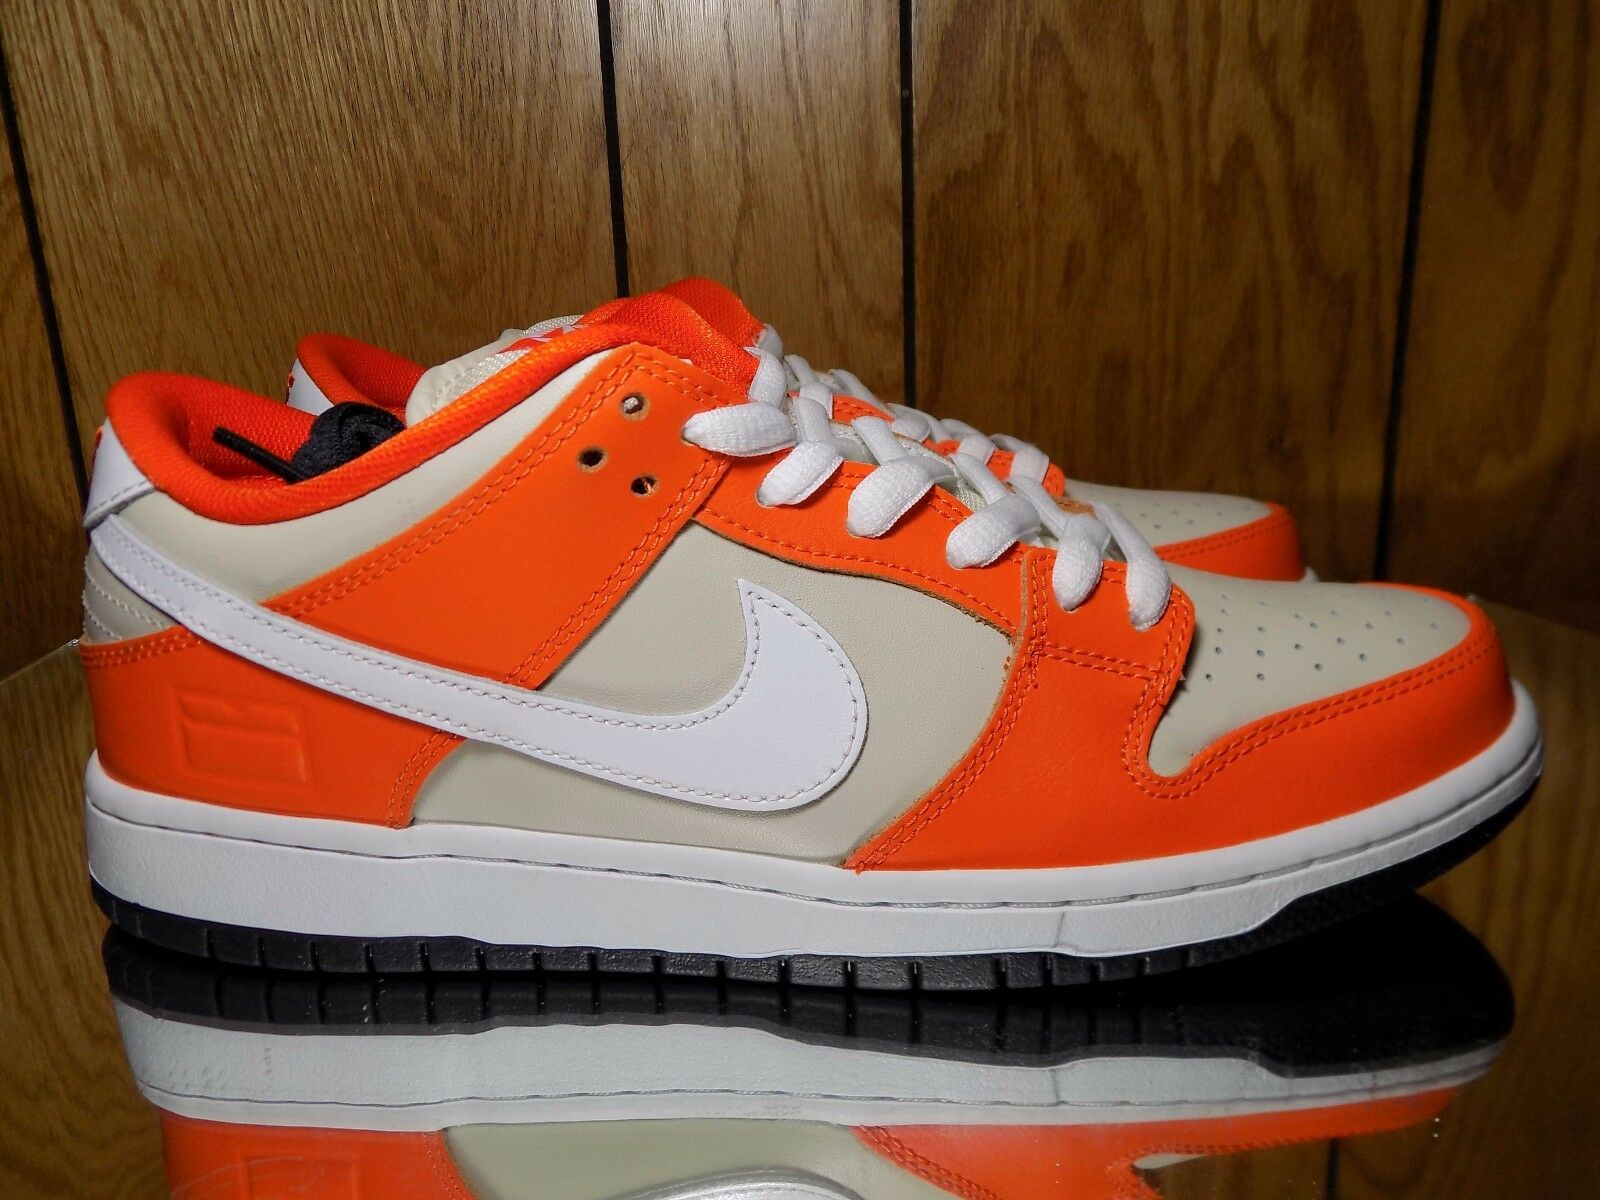 75b4653c750 Nike Sb Eric Koston Grey Nike Sb Eric Koston Shoes